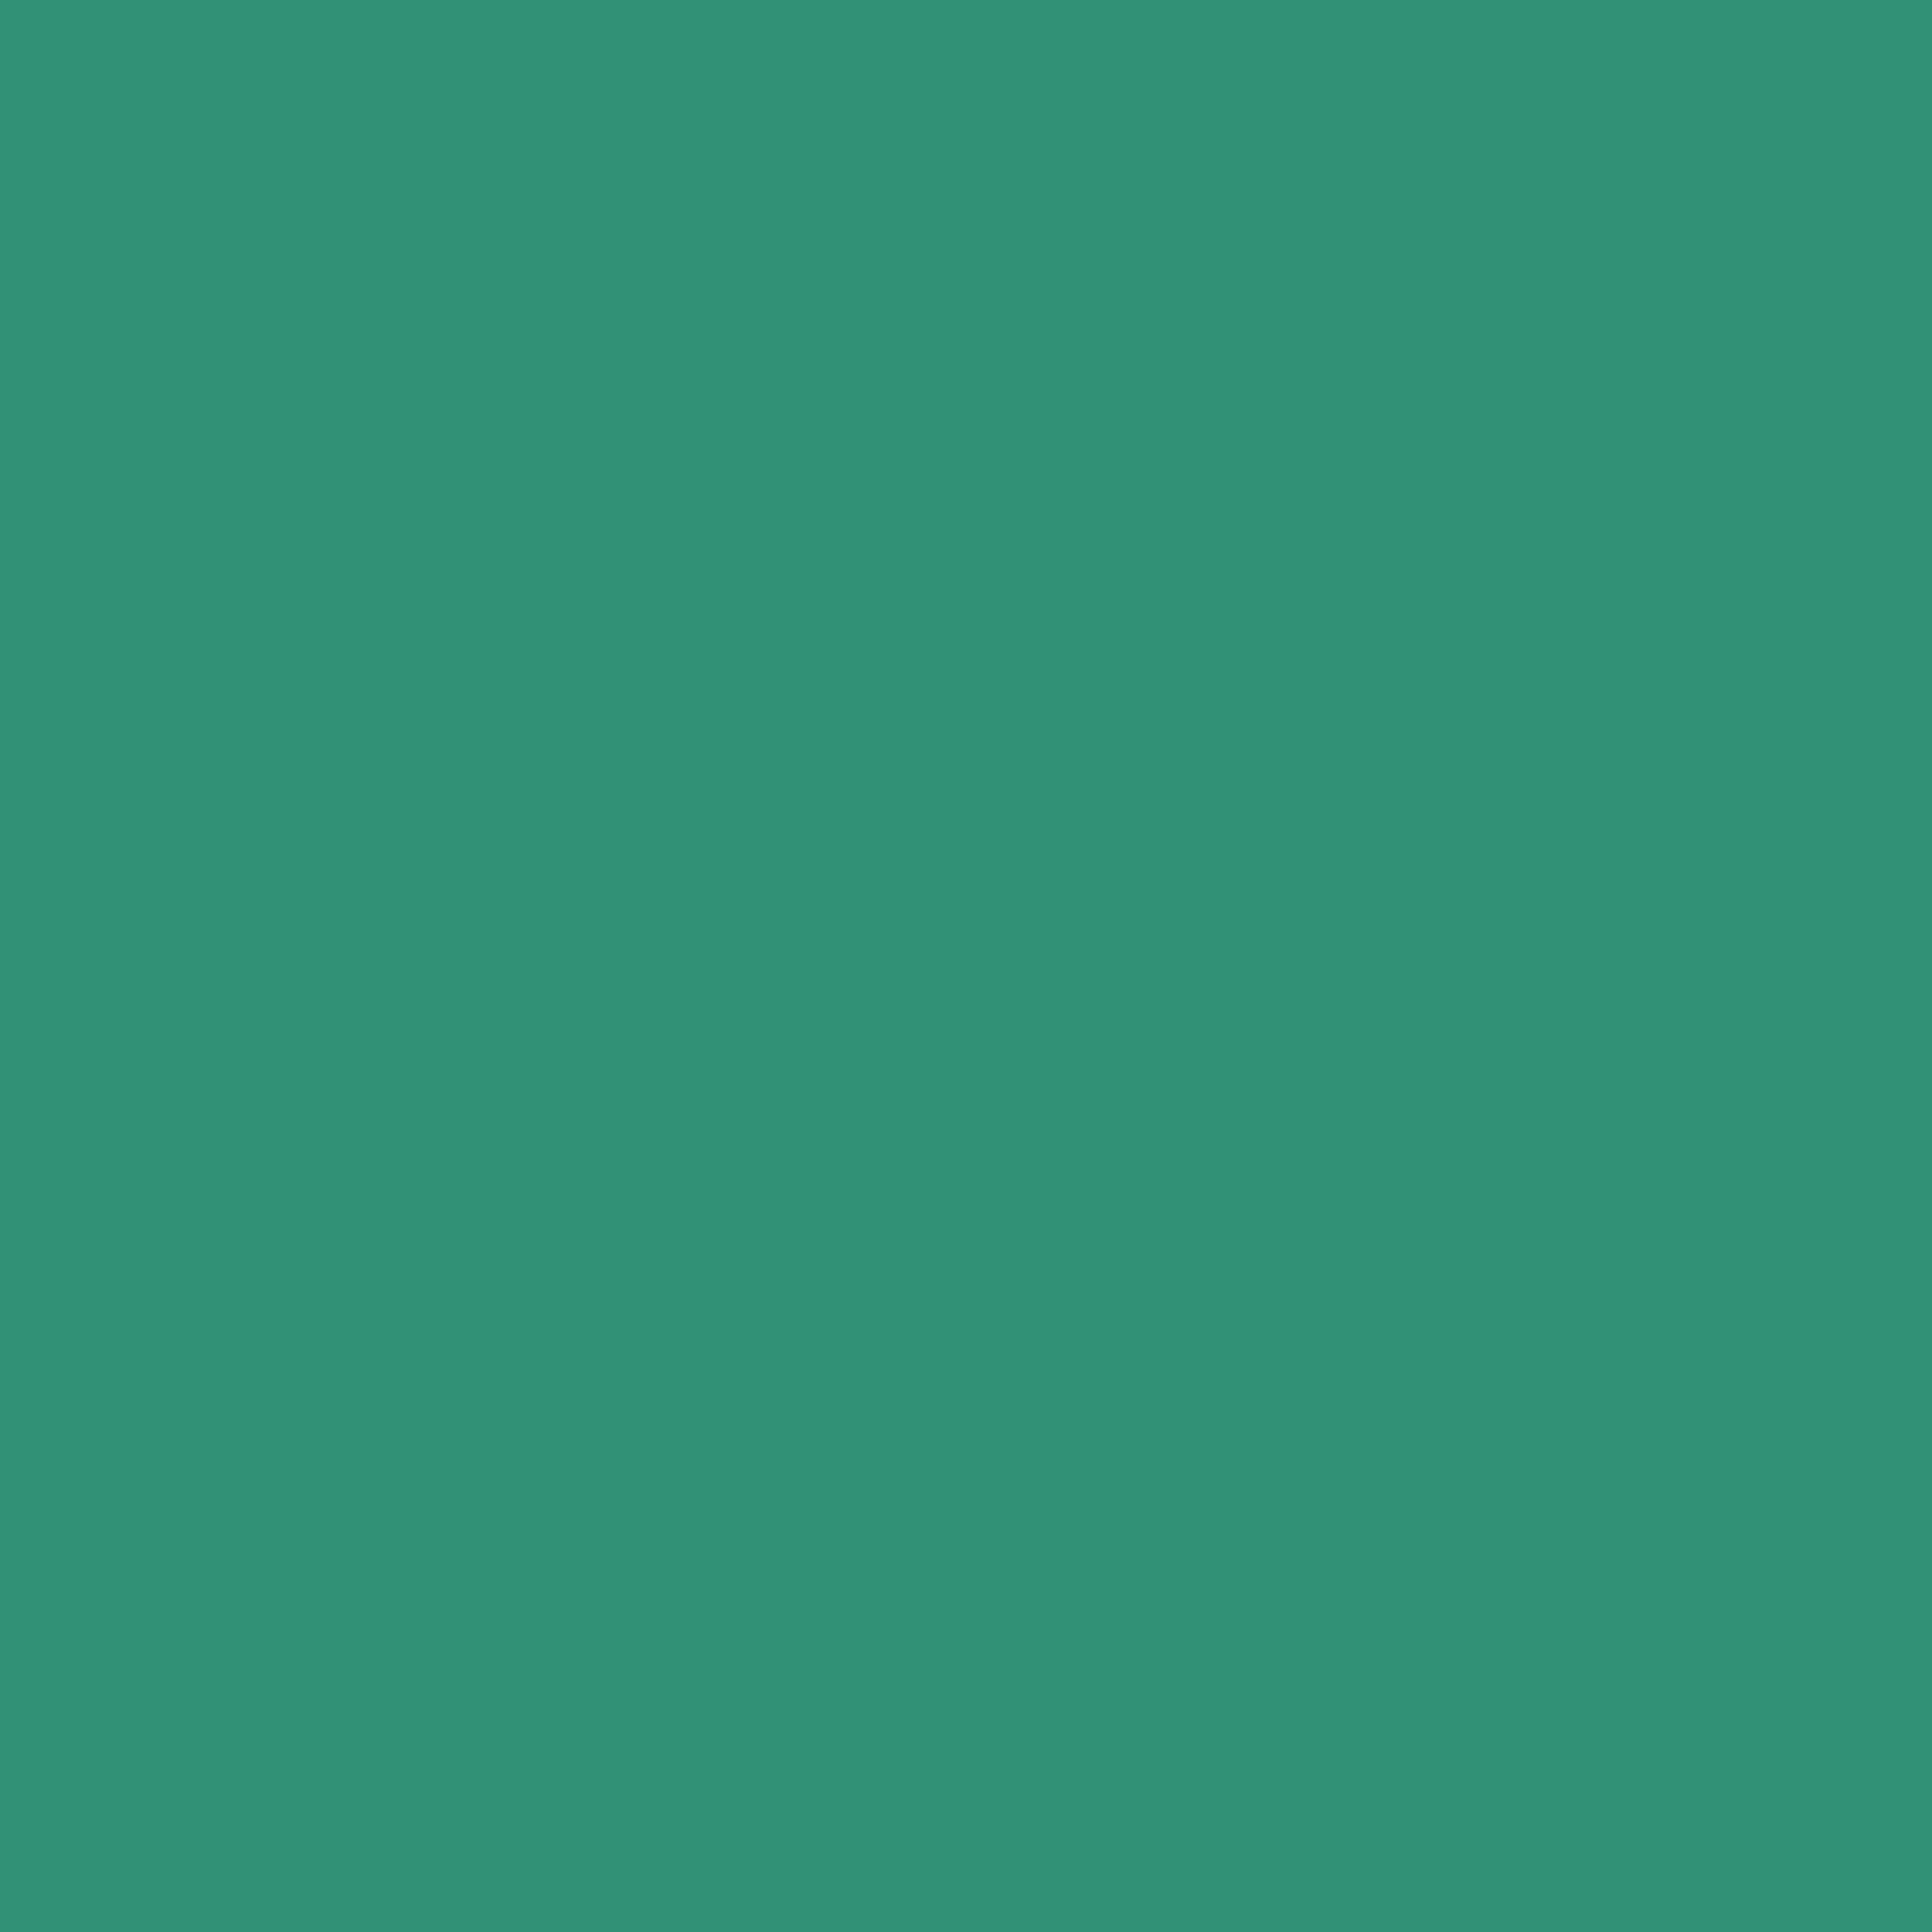 2732x2732 Illuminating Emerald Solid Color Background 2732x2732